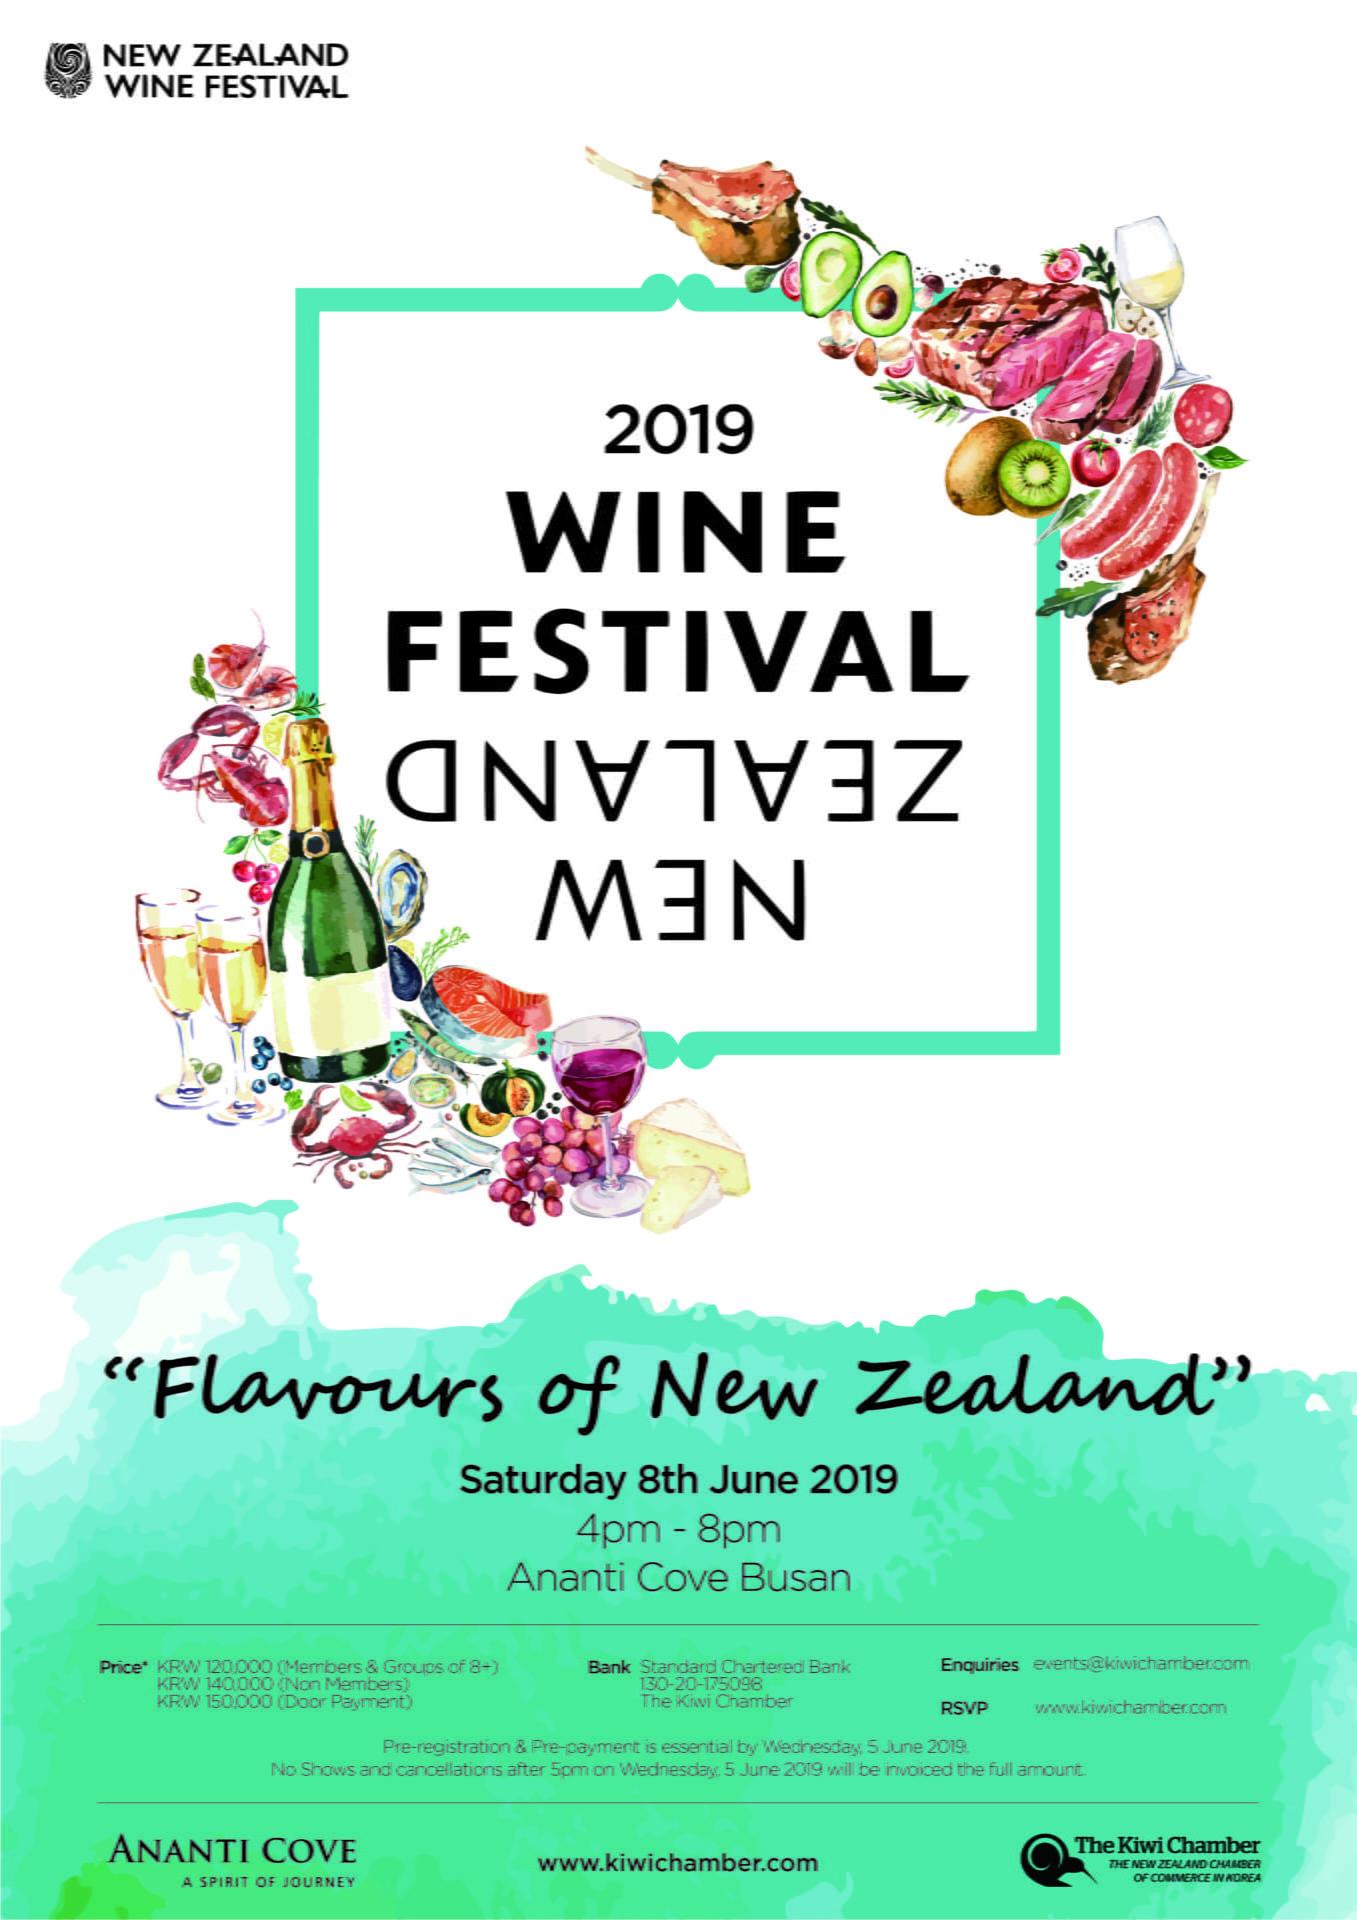 2019 New Zealand Wine Festival Busan